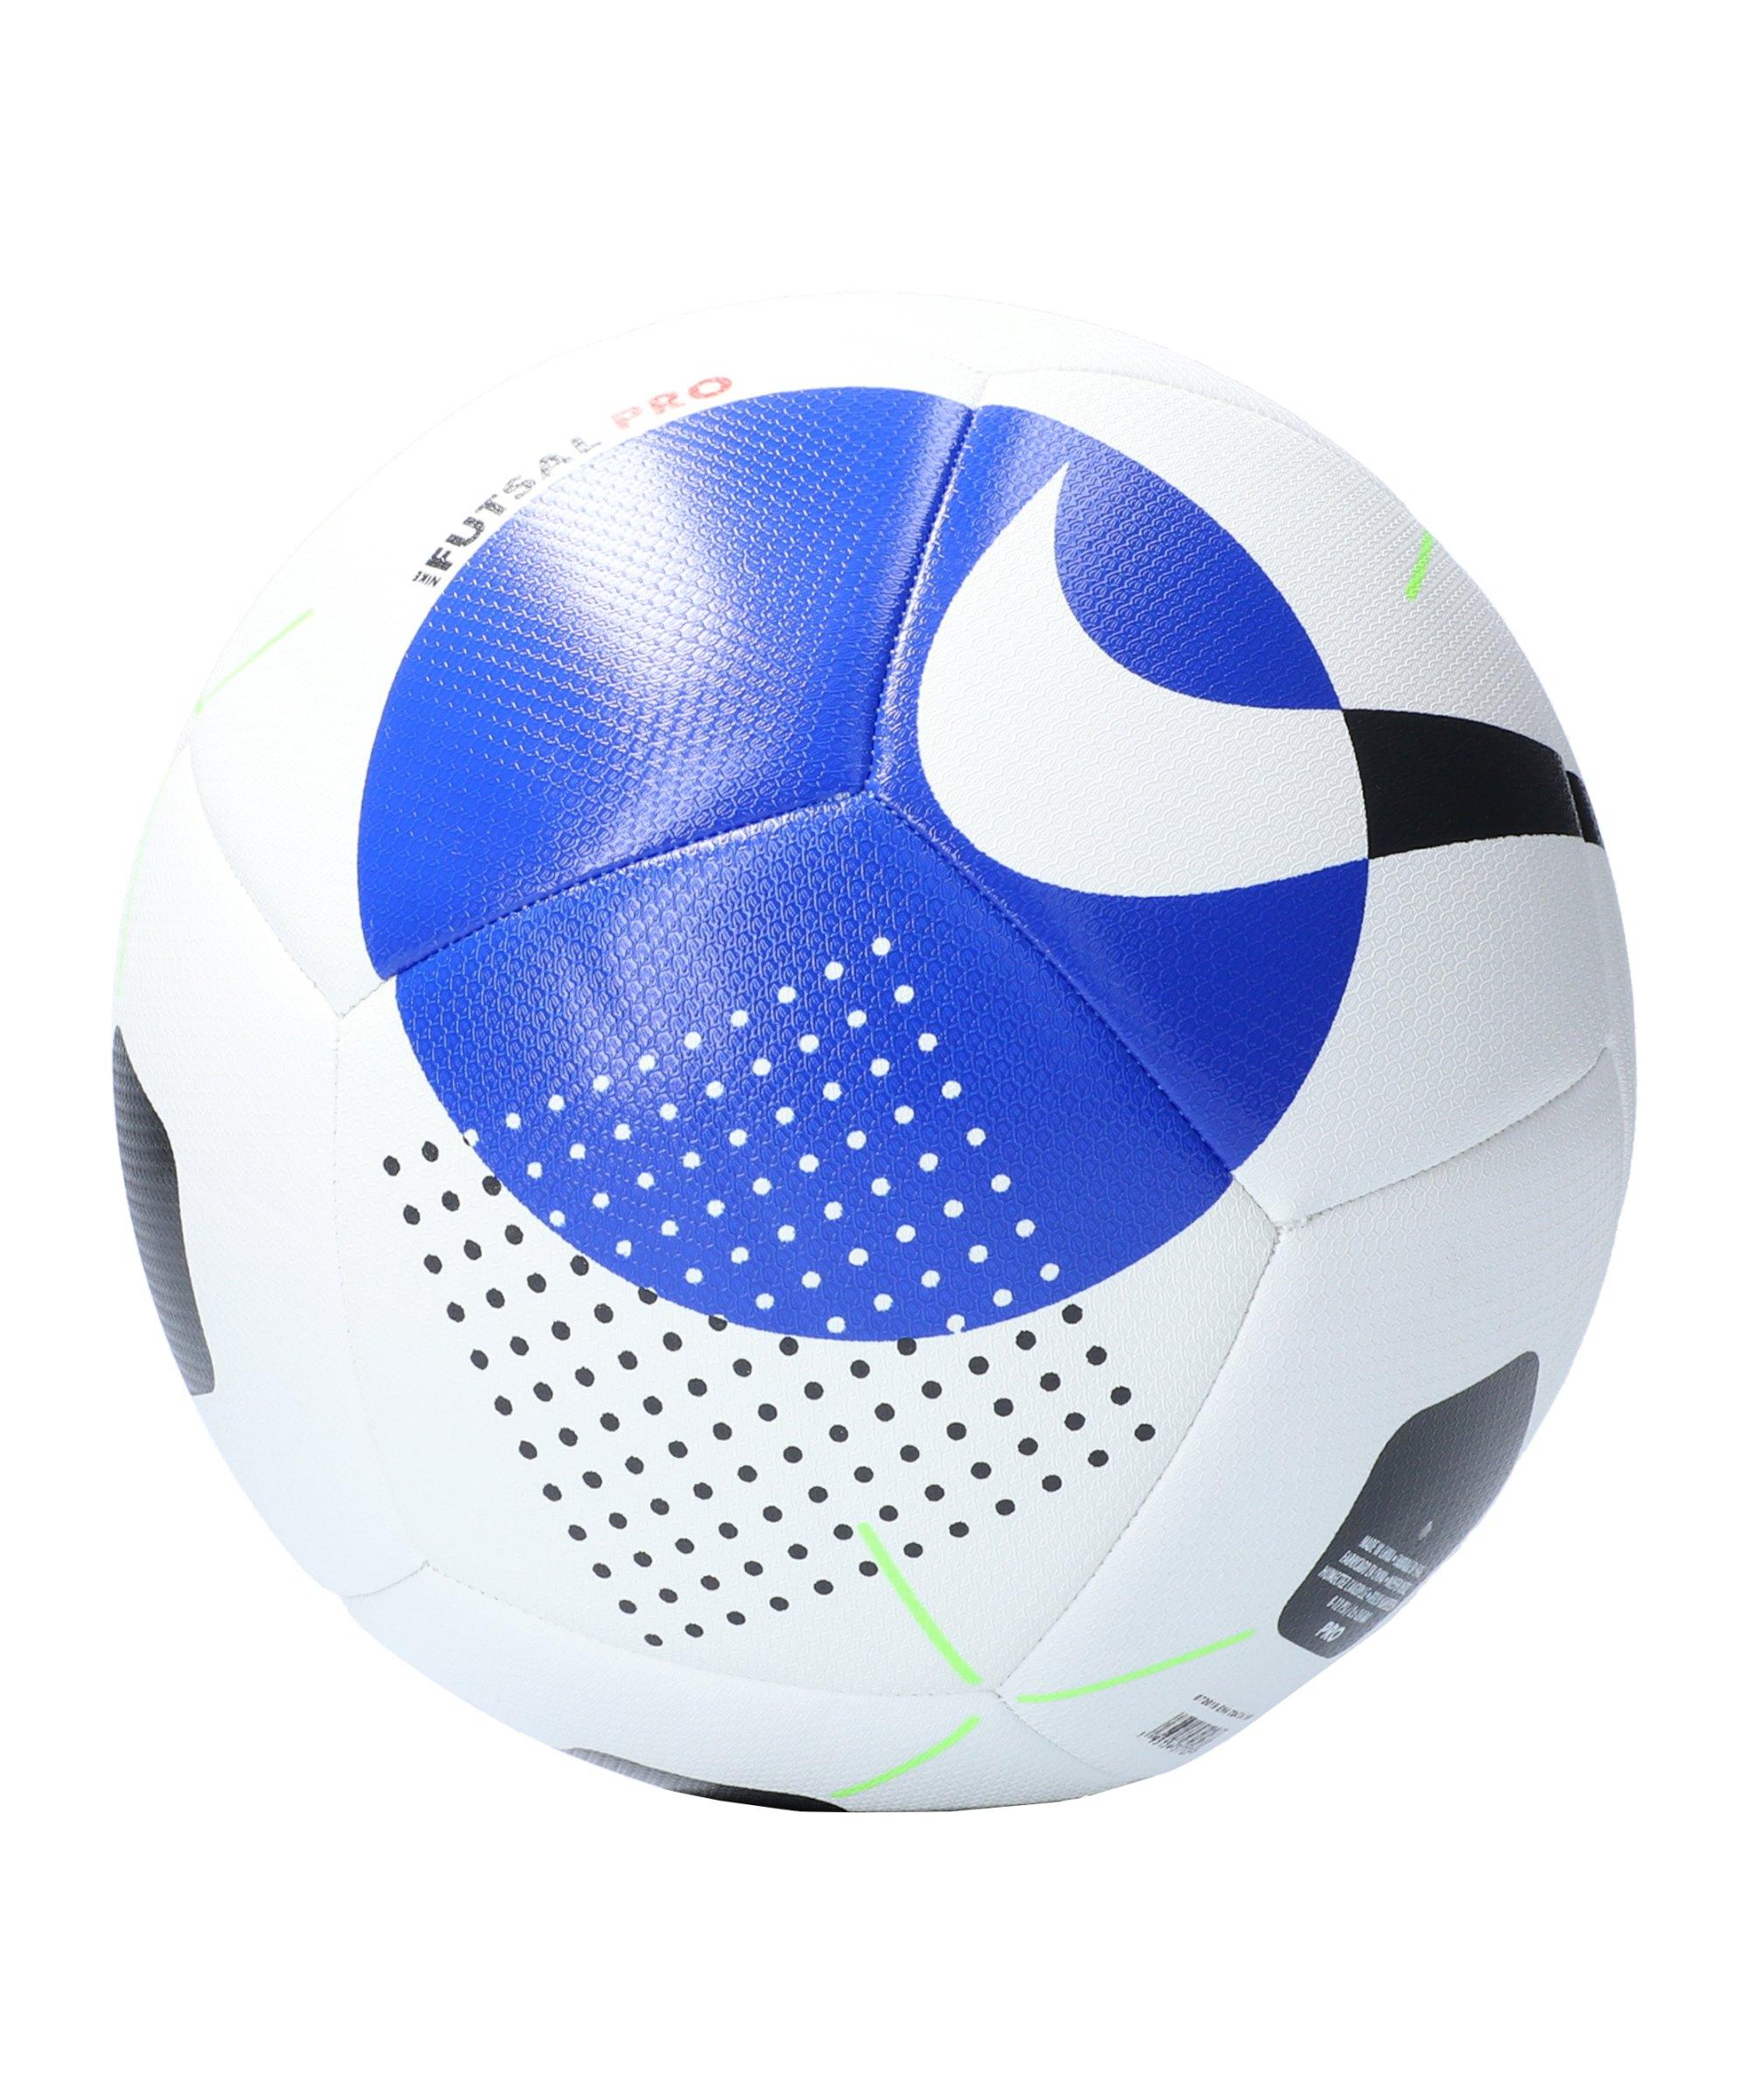 Nike Pro PROMO Futsalball Weiss Blau F100 - weiss